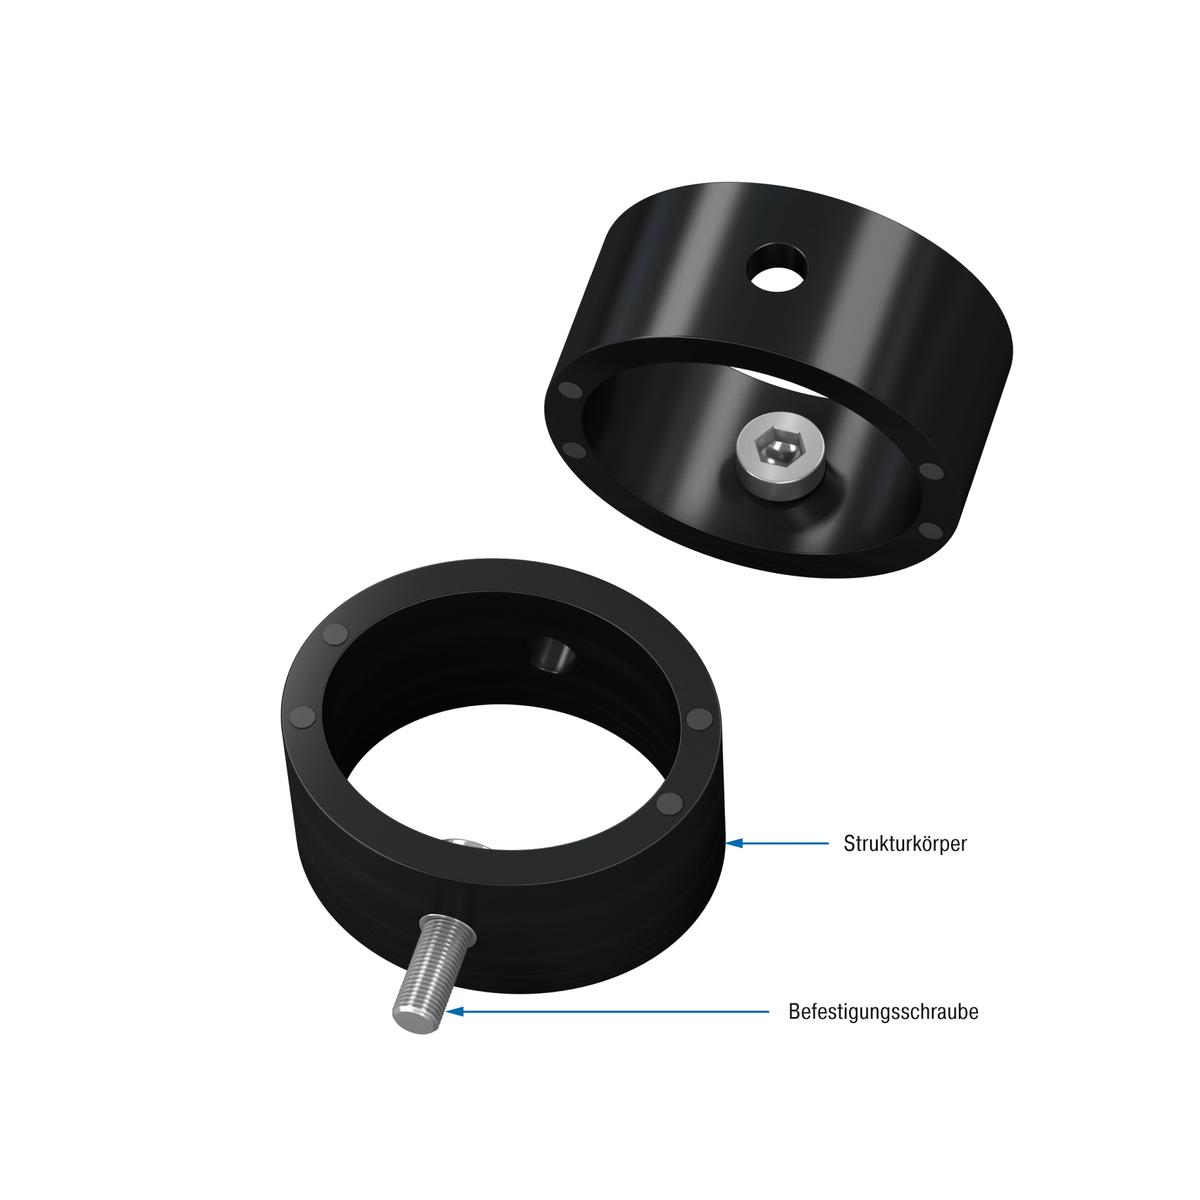 ACE Stoßdämpfer GmbH - Bild - TR-H